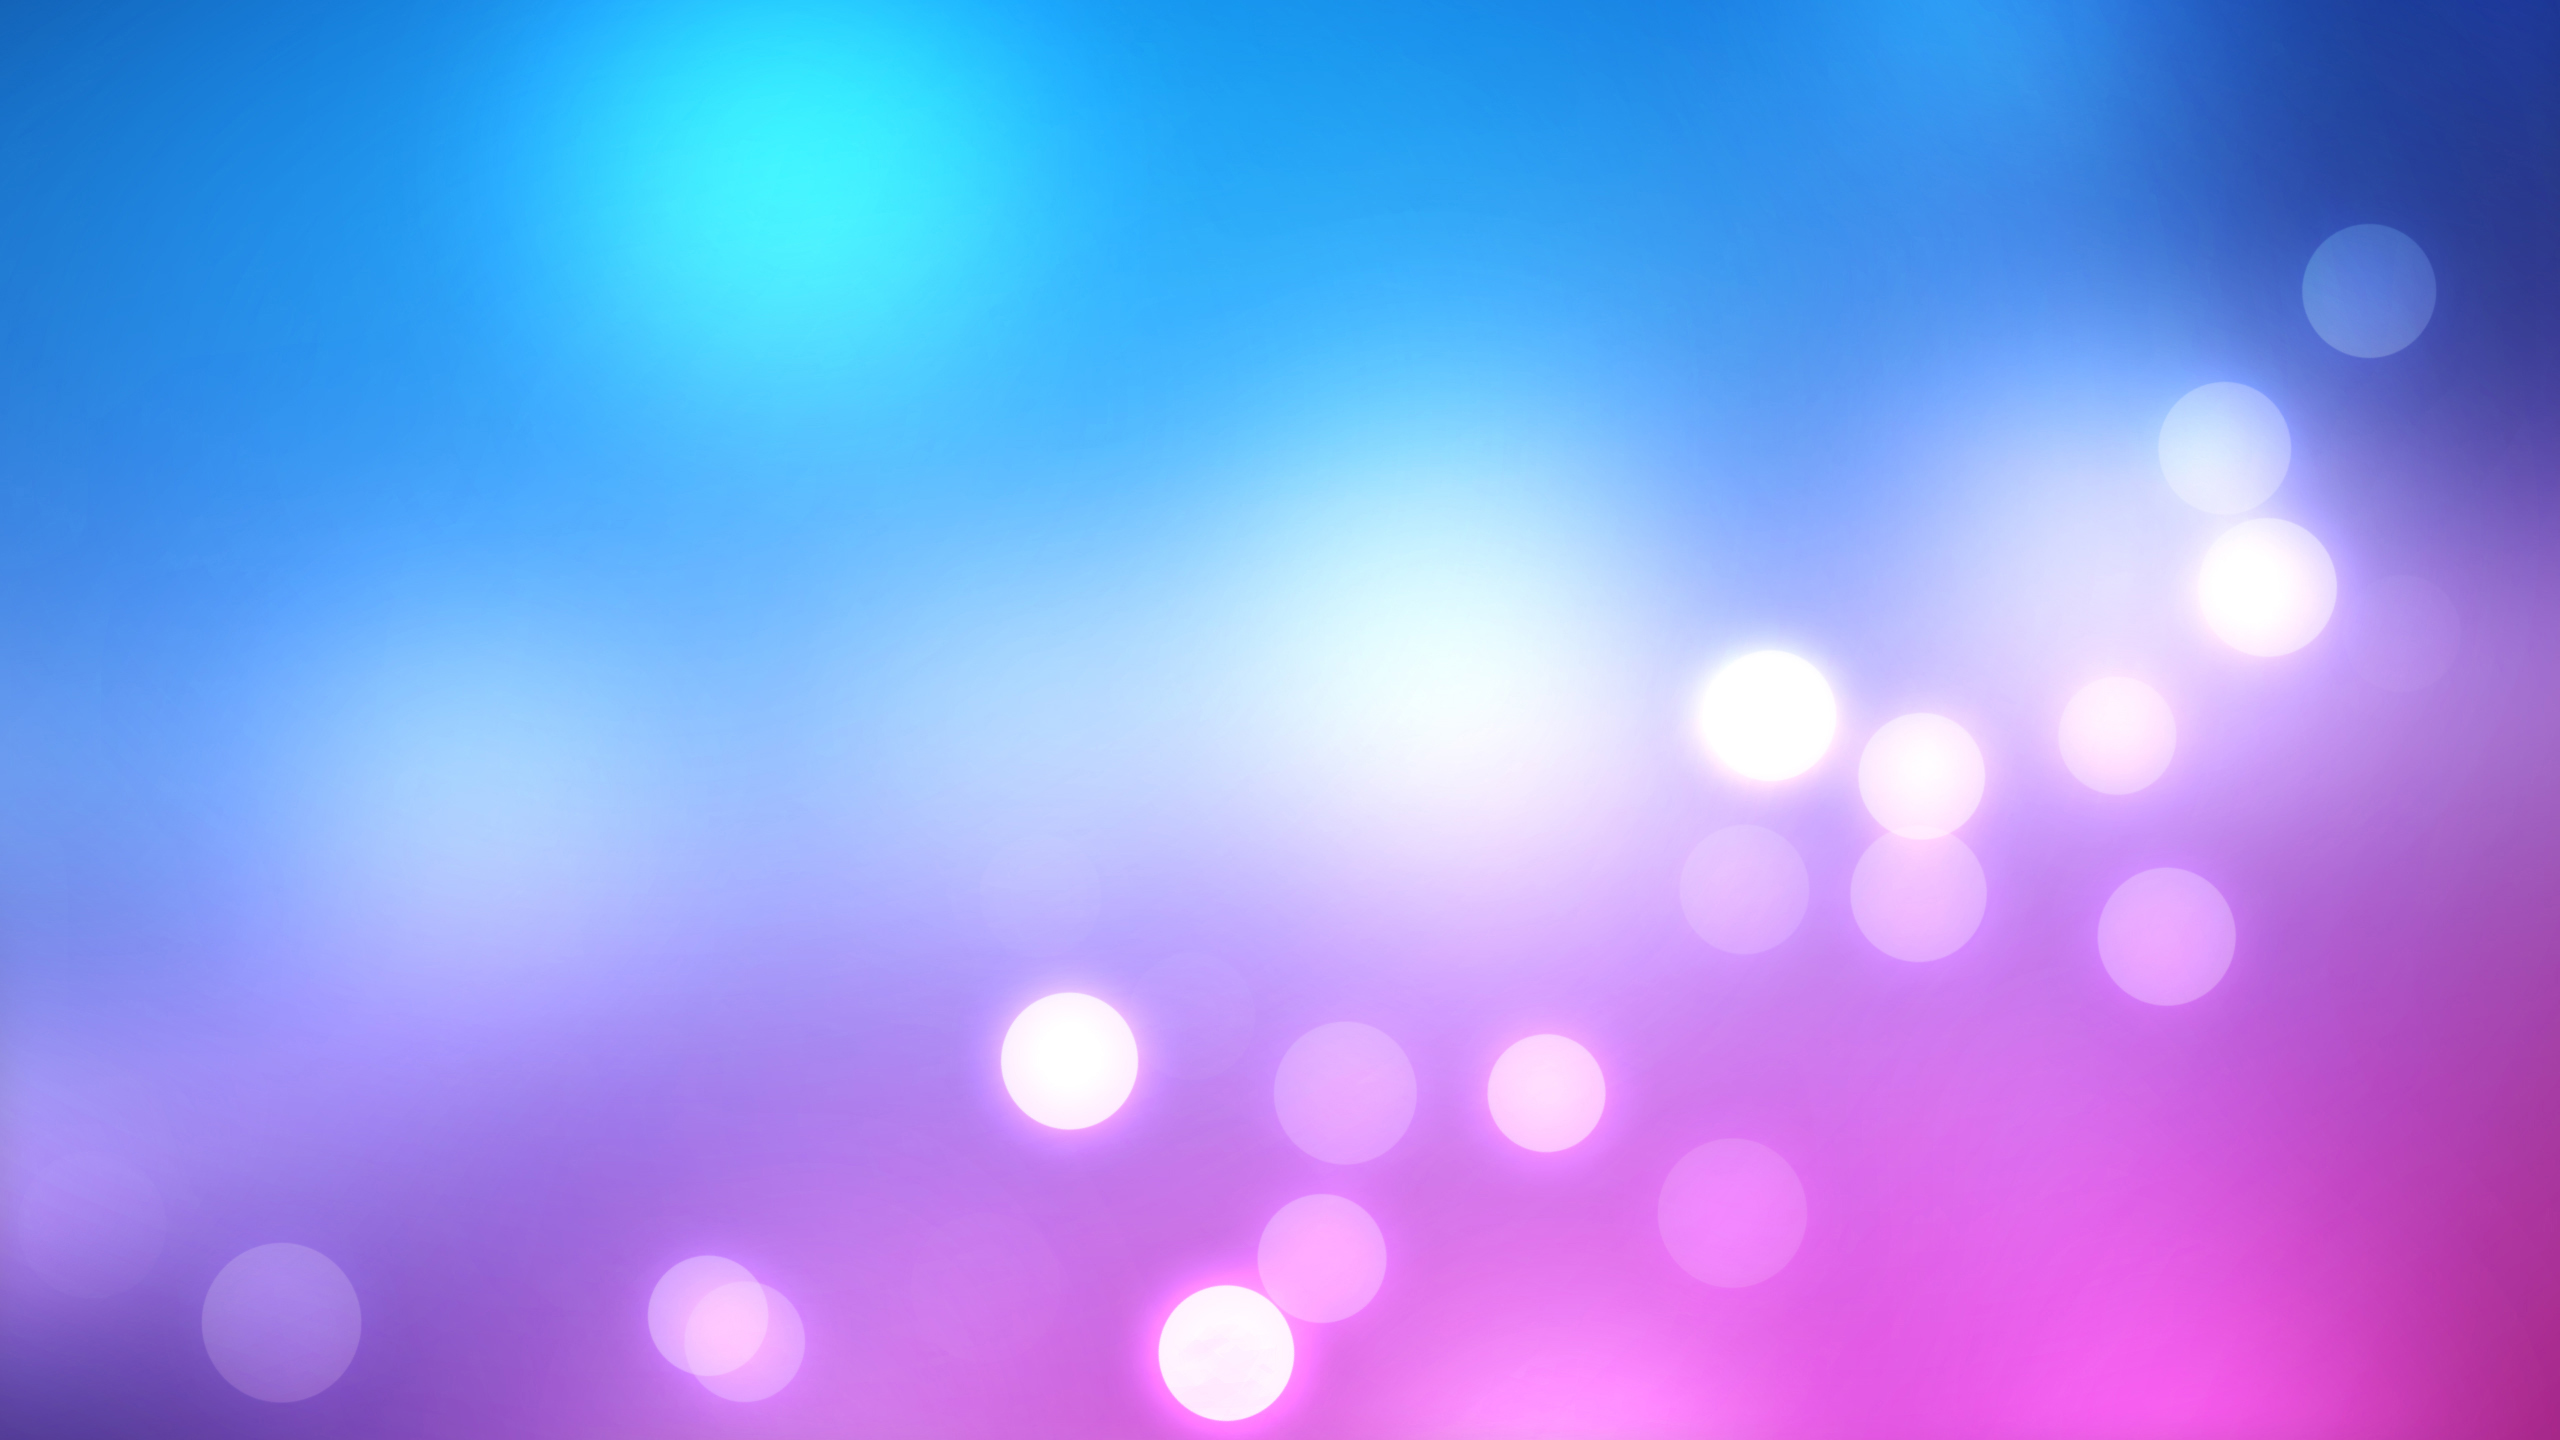 purple wallpapers blue lights bokeh wallpaper desktop 2560x1440